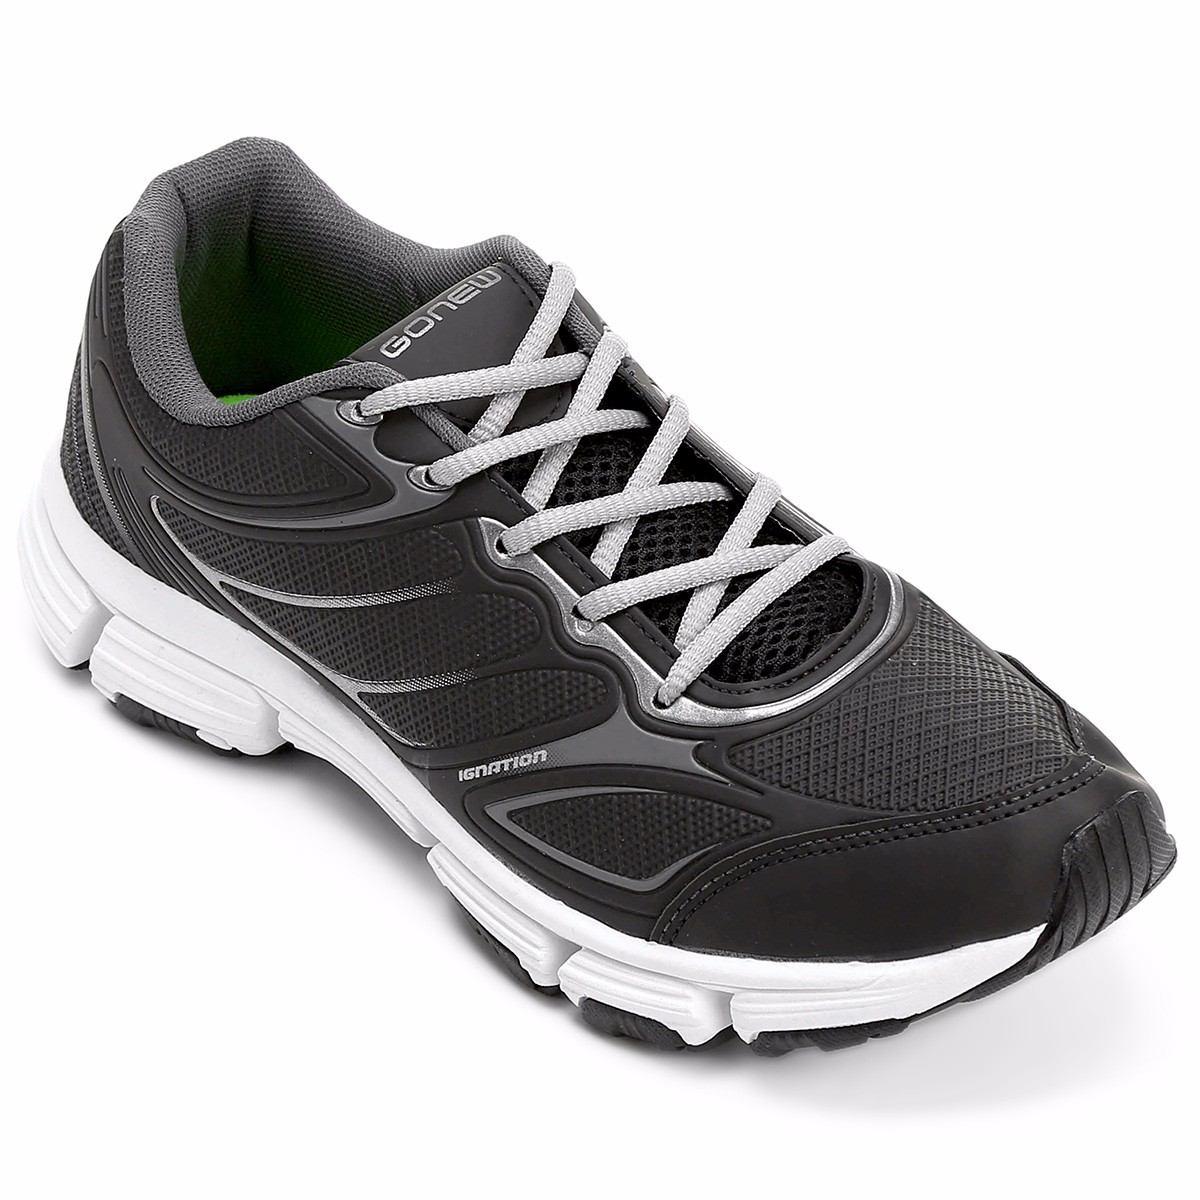 802b4dacbe9 tênis gonew caminha running masculino. Carregando zoom.